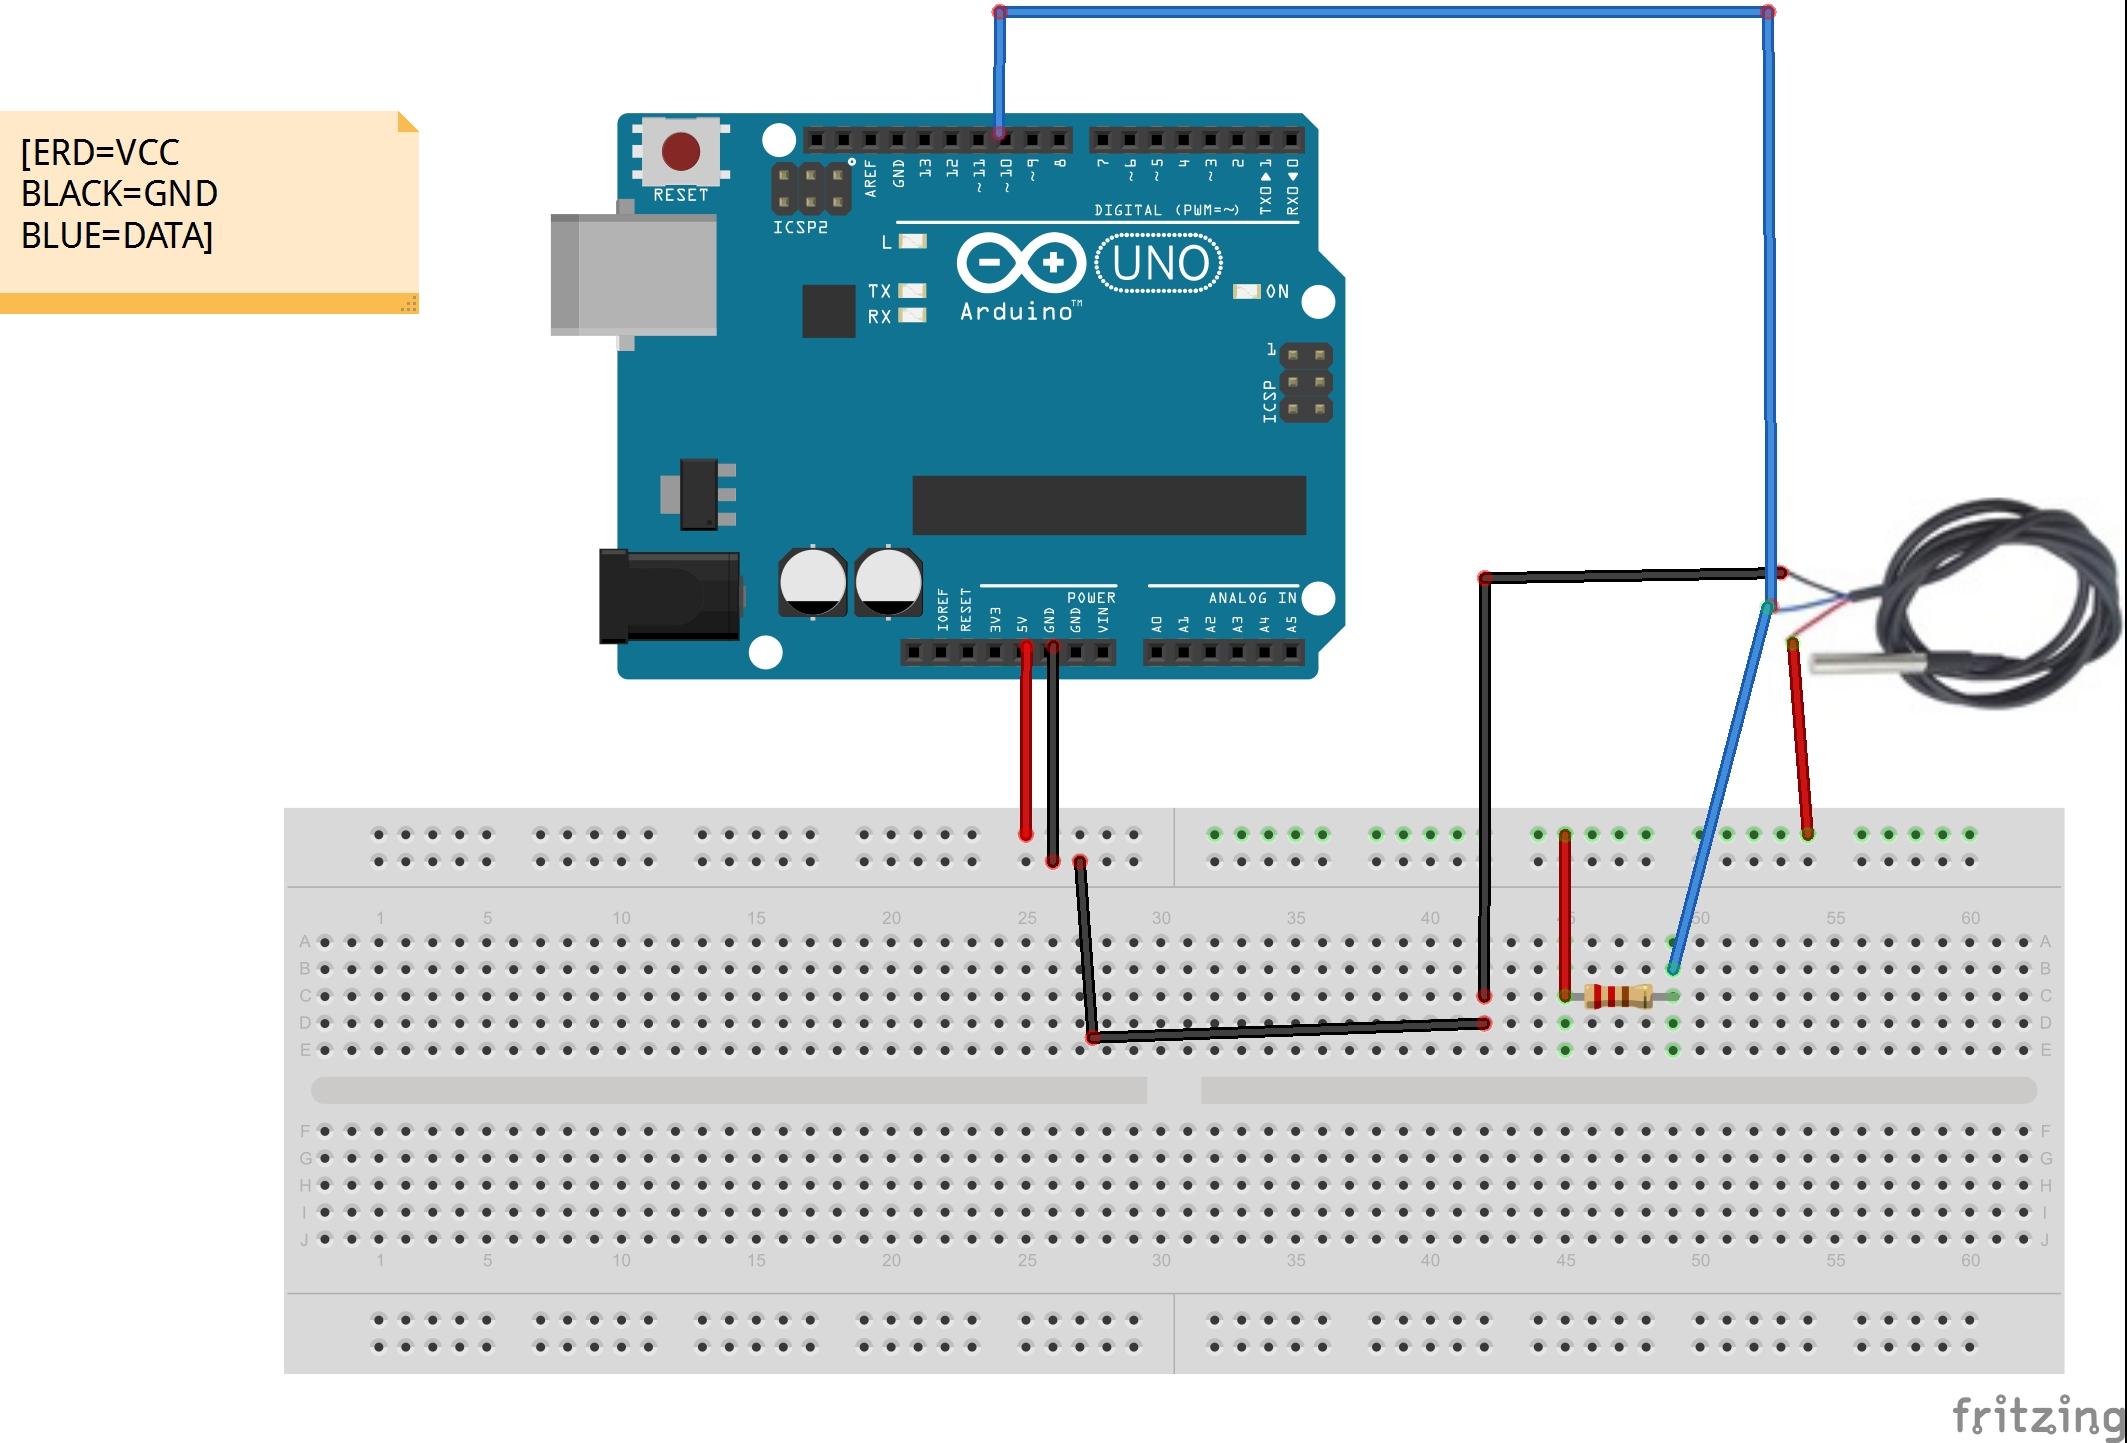 Ds18b20 Temperature Sensor Diagram - Trusted Wiring Diagrams •